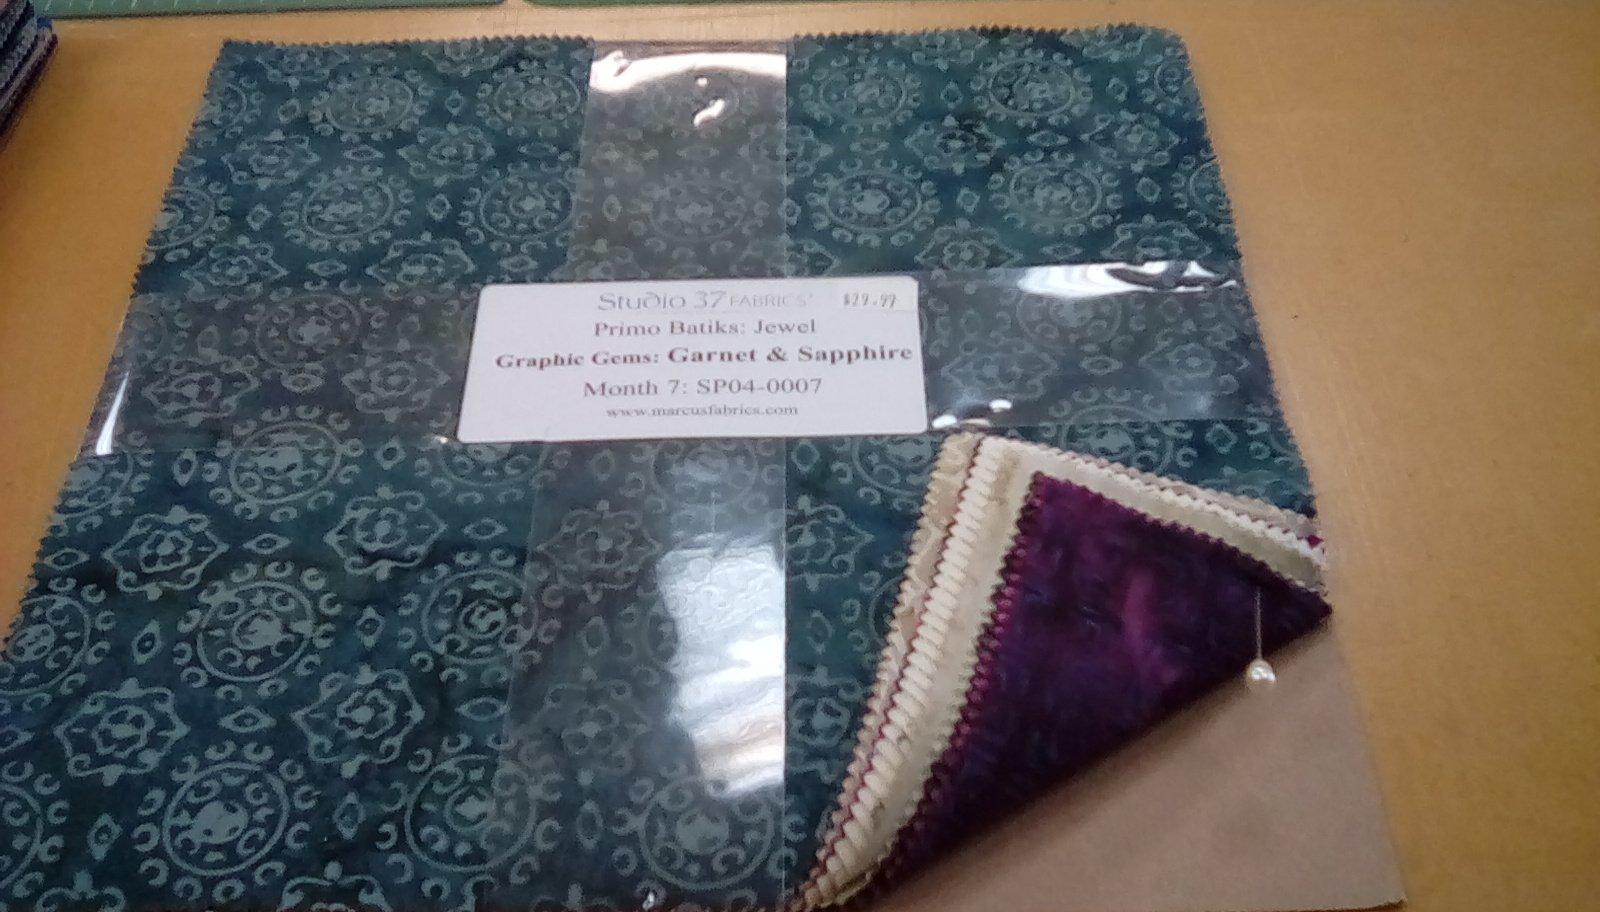 Primo Batiks:Jewel Graphic Gems: Garnet & Sapphire Month 7